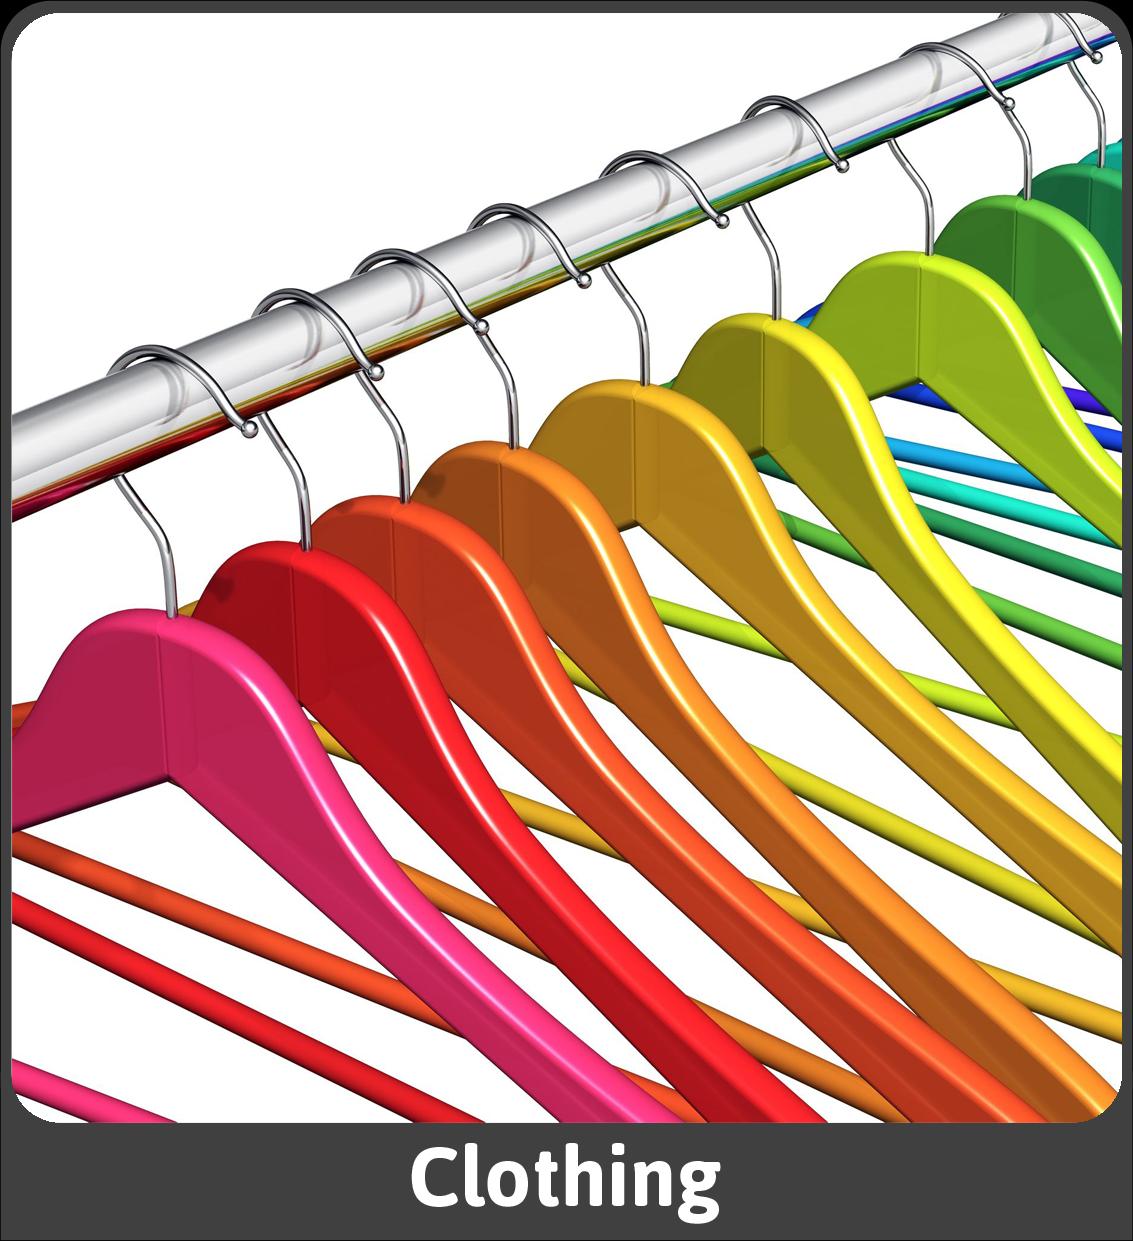 Clothing Panel